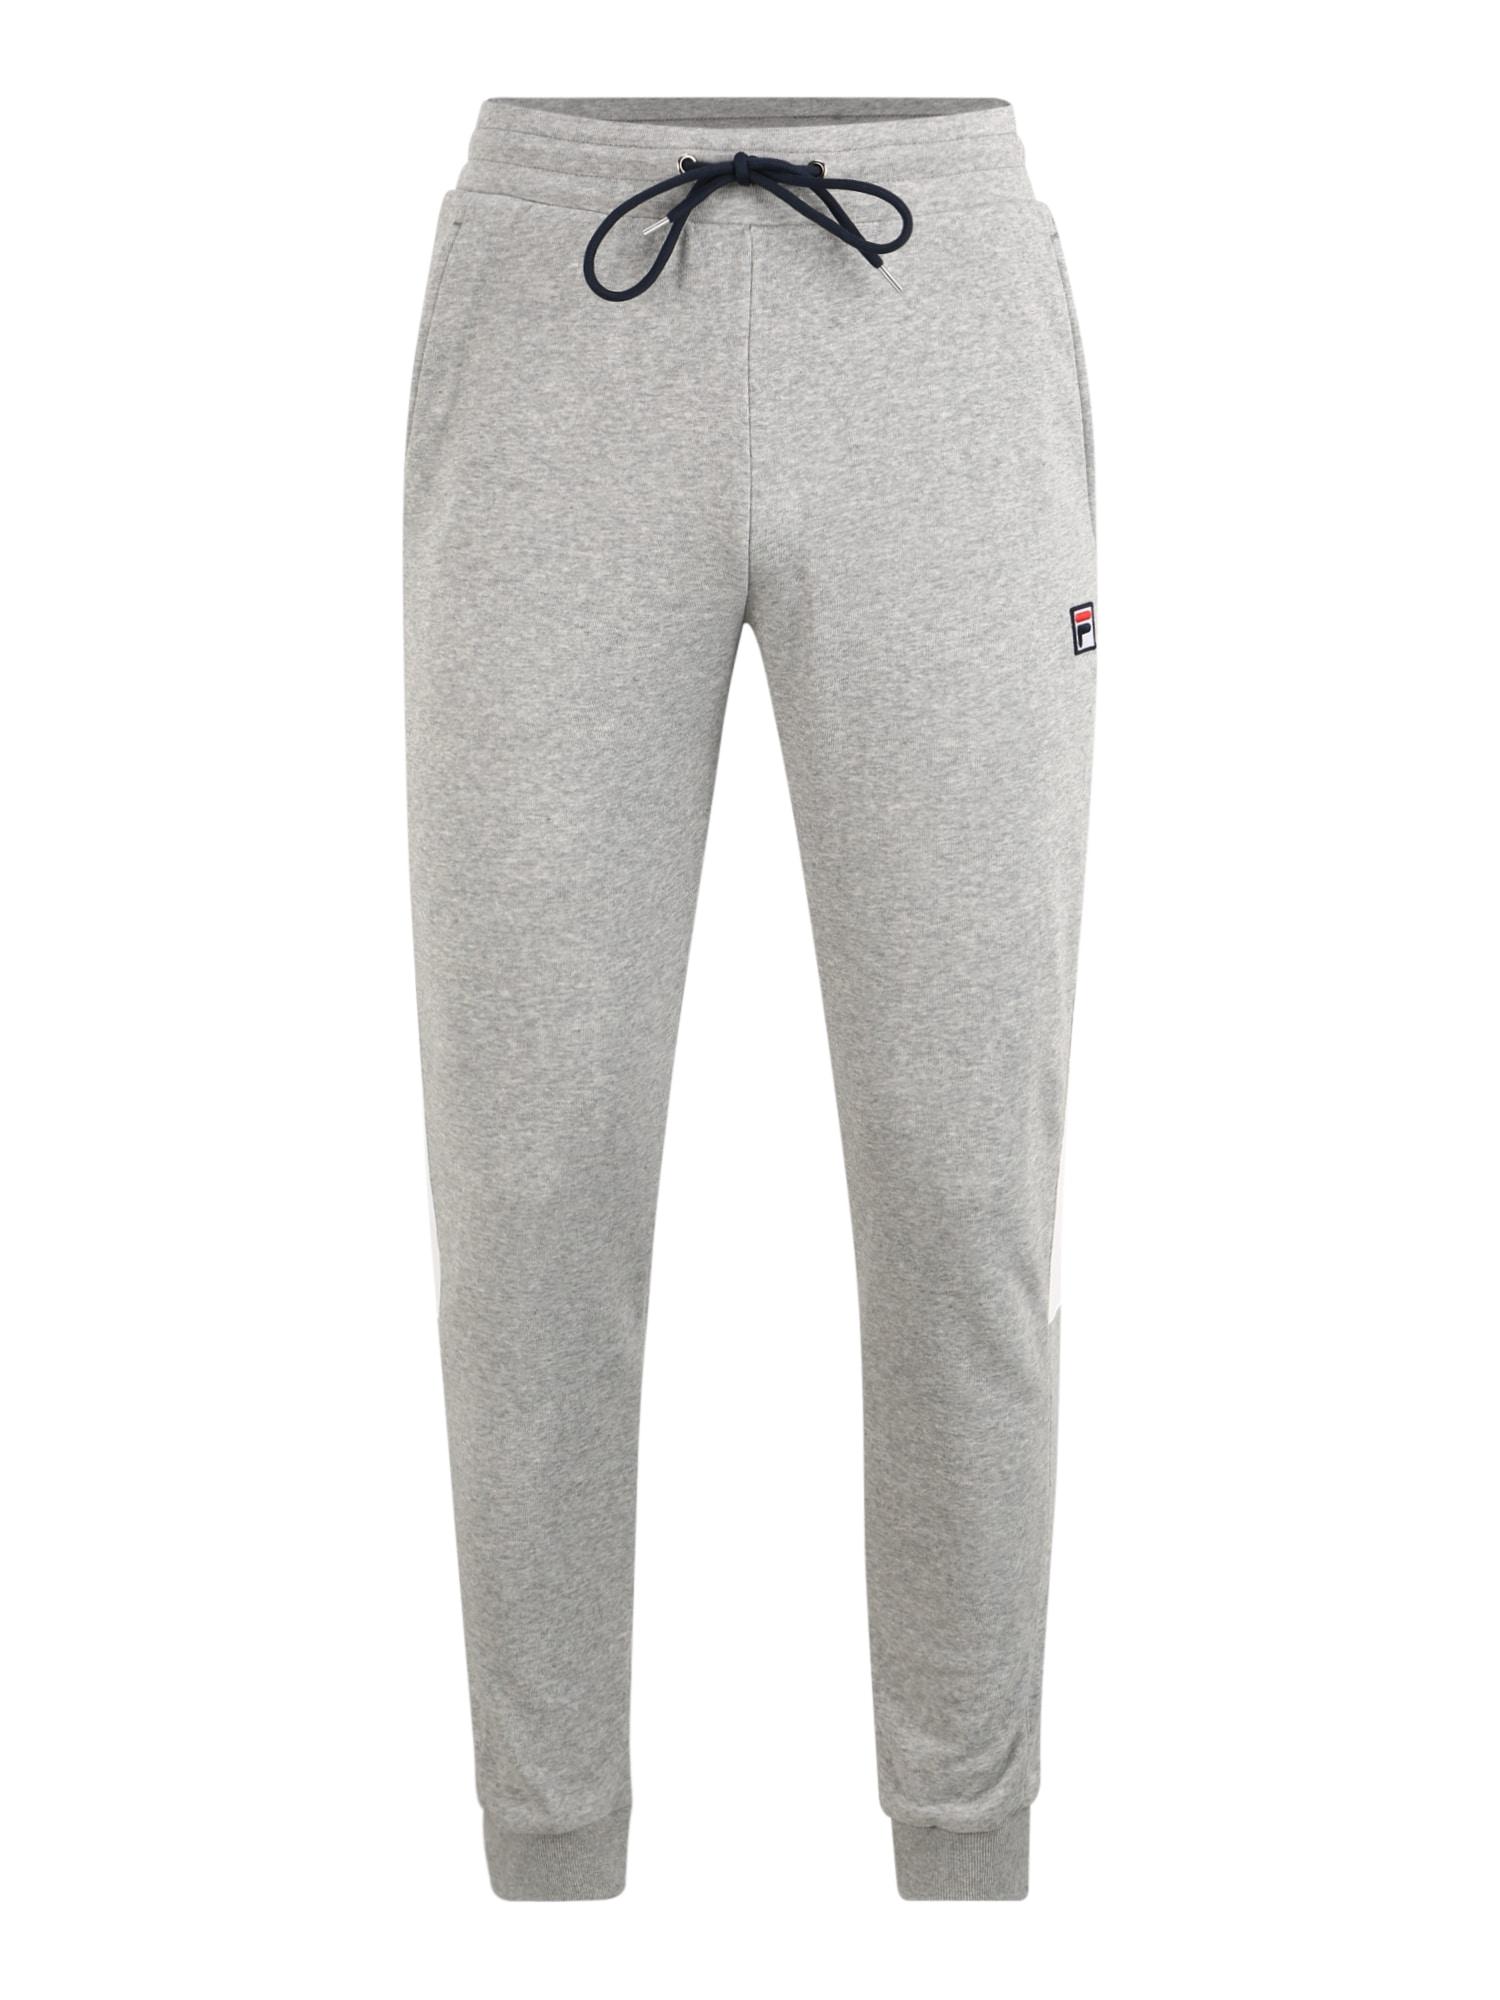 FILA Sportovní kalhoty 'Freddie'  šedá